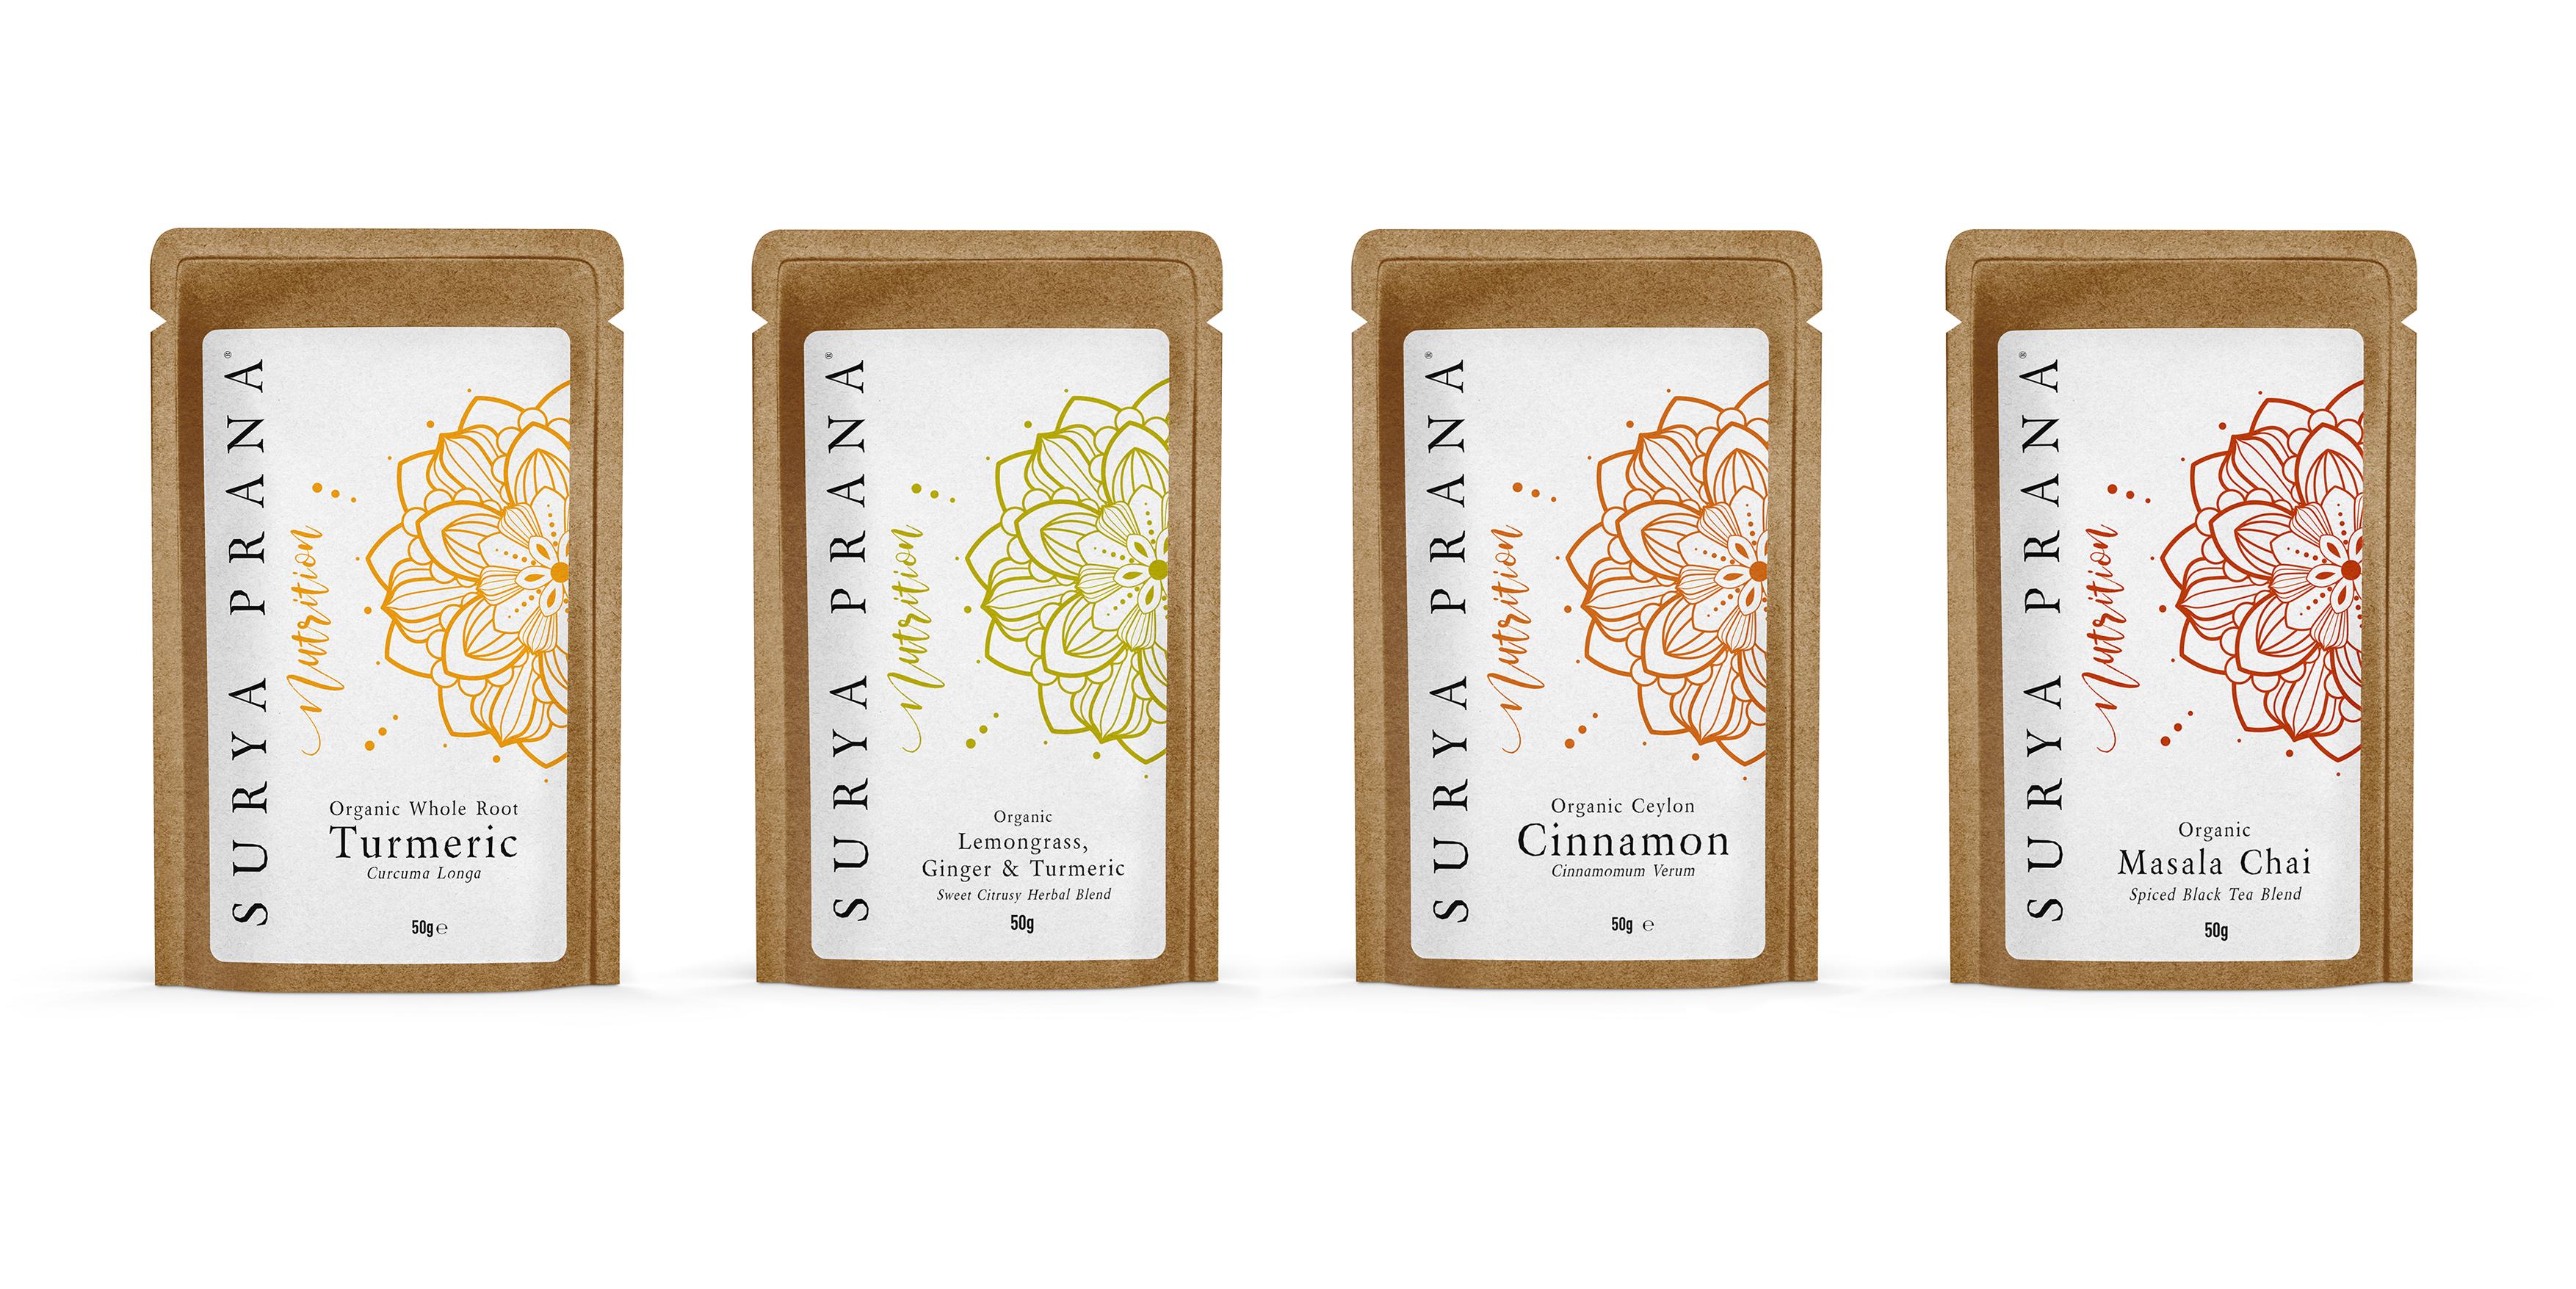 Surya Prana Nutrition Packaging Design